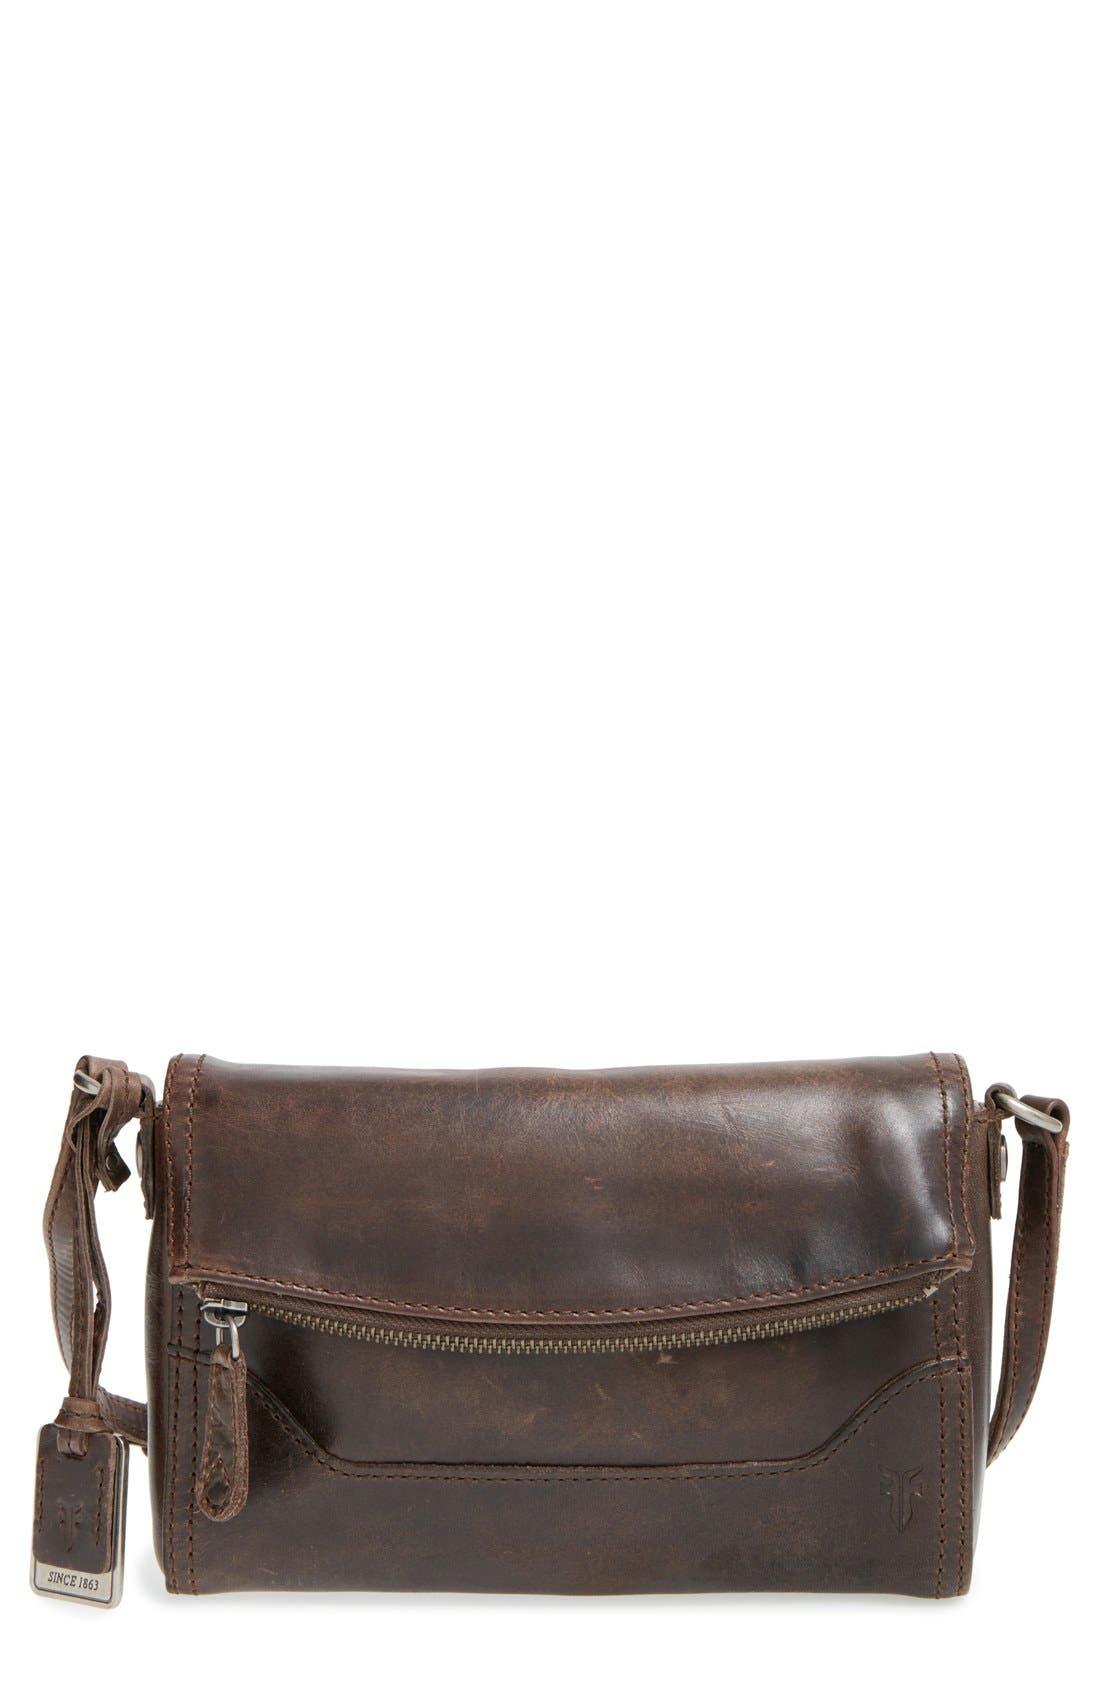 'Melissa' Foldover Flap Crossbody Bag,                             Main thumbnail 1, color,                             020